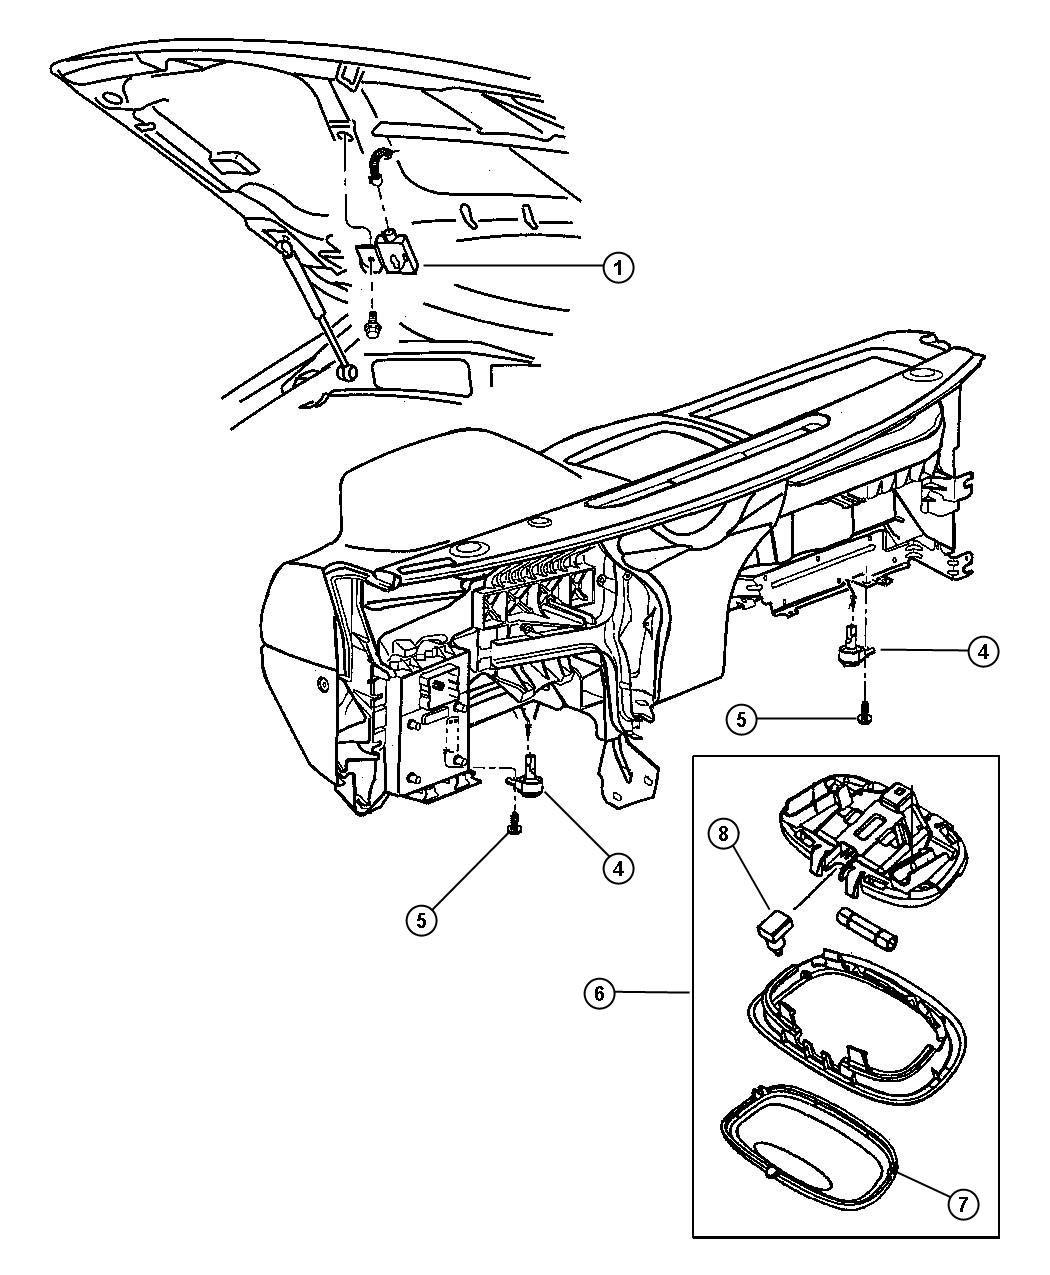 [DIAGRAM] 05 Chrysler 300 Ignition Wiring Diagram FULL